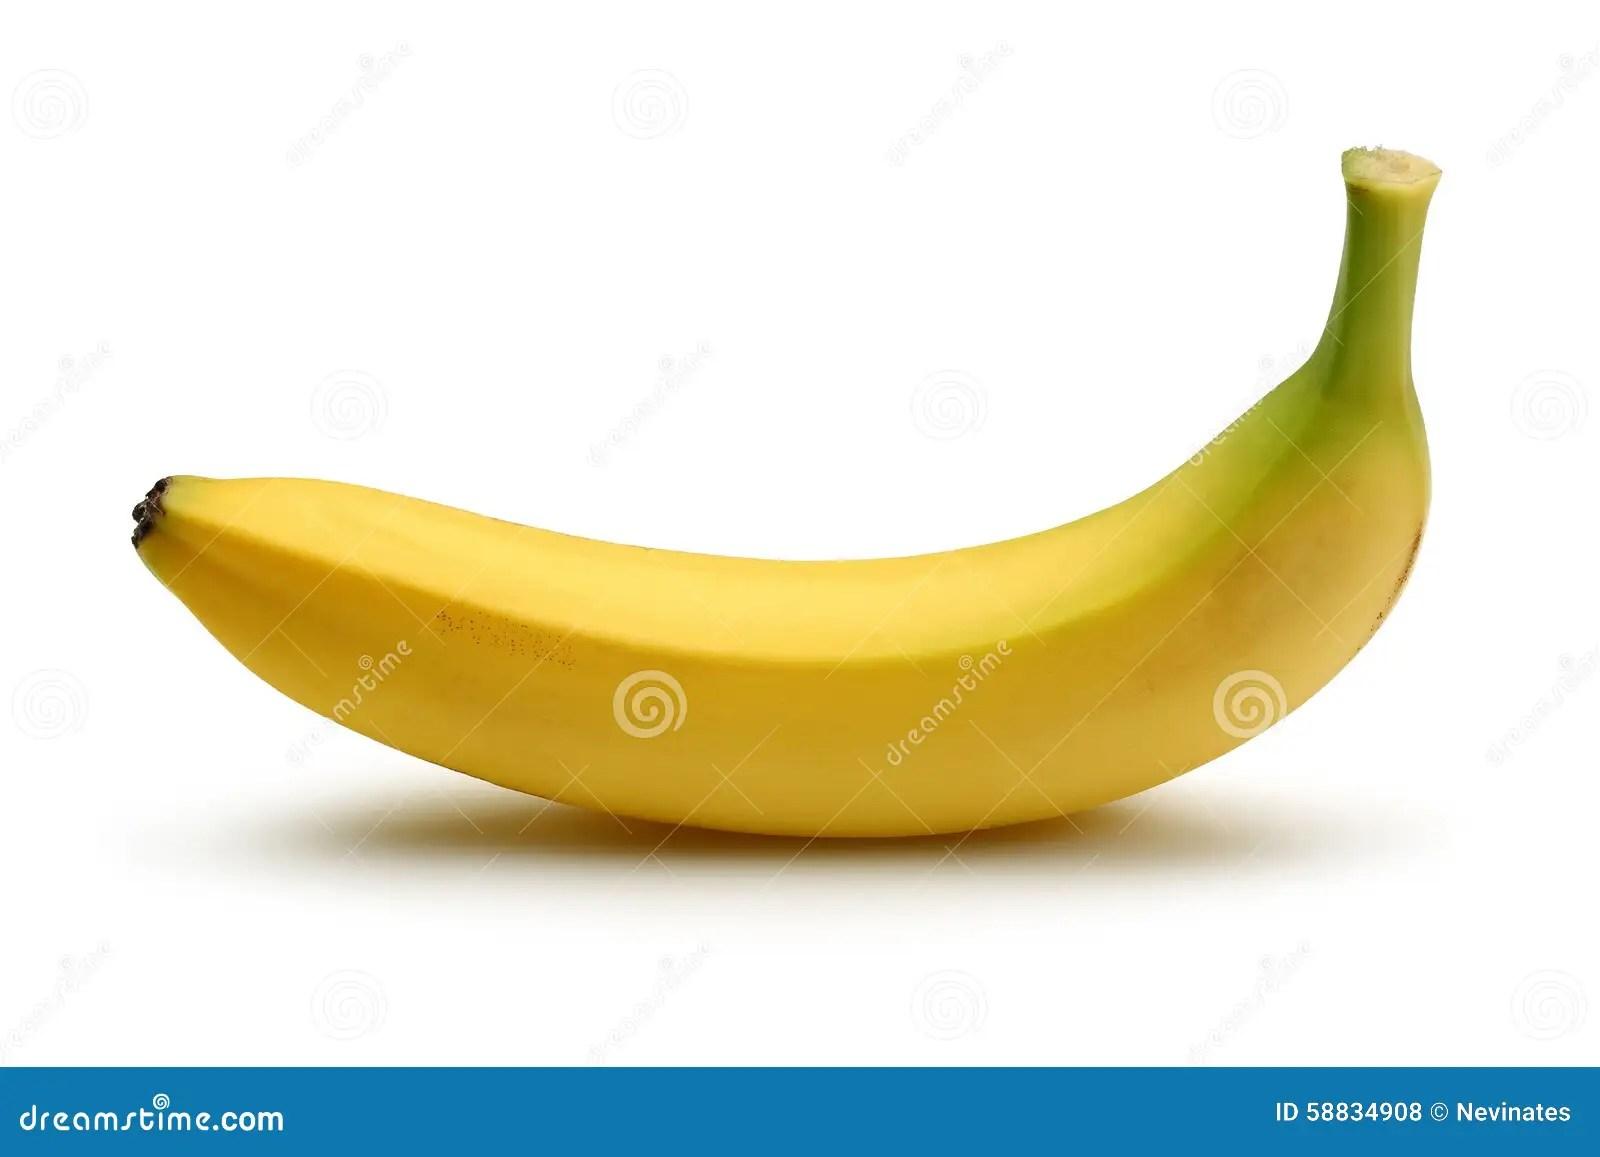 335 060 Banana Photos Free Royalty Free Stock Photos From Dreamstime